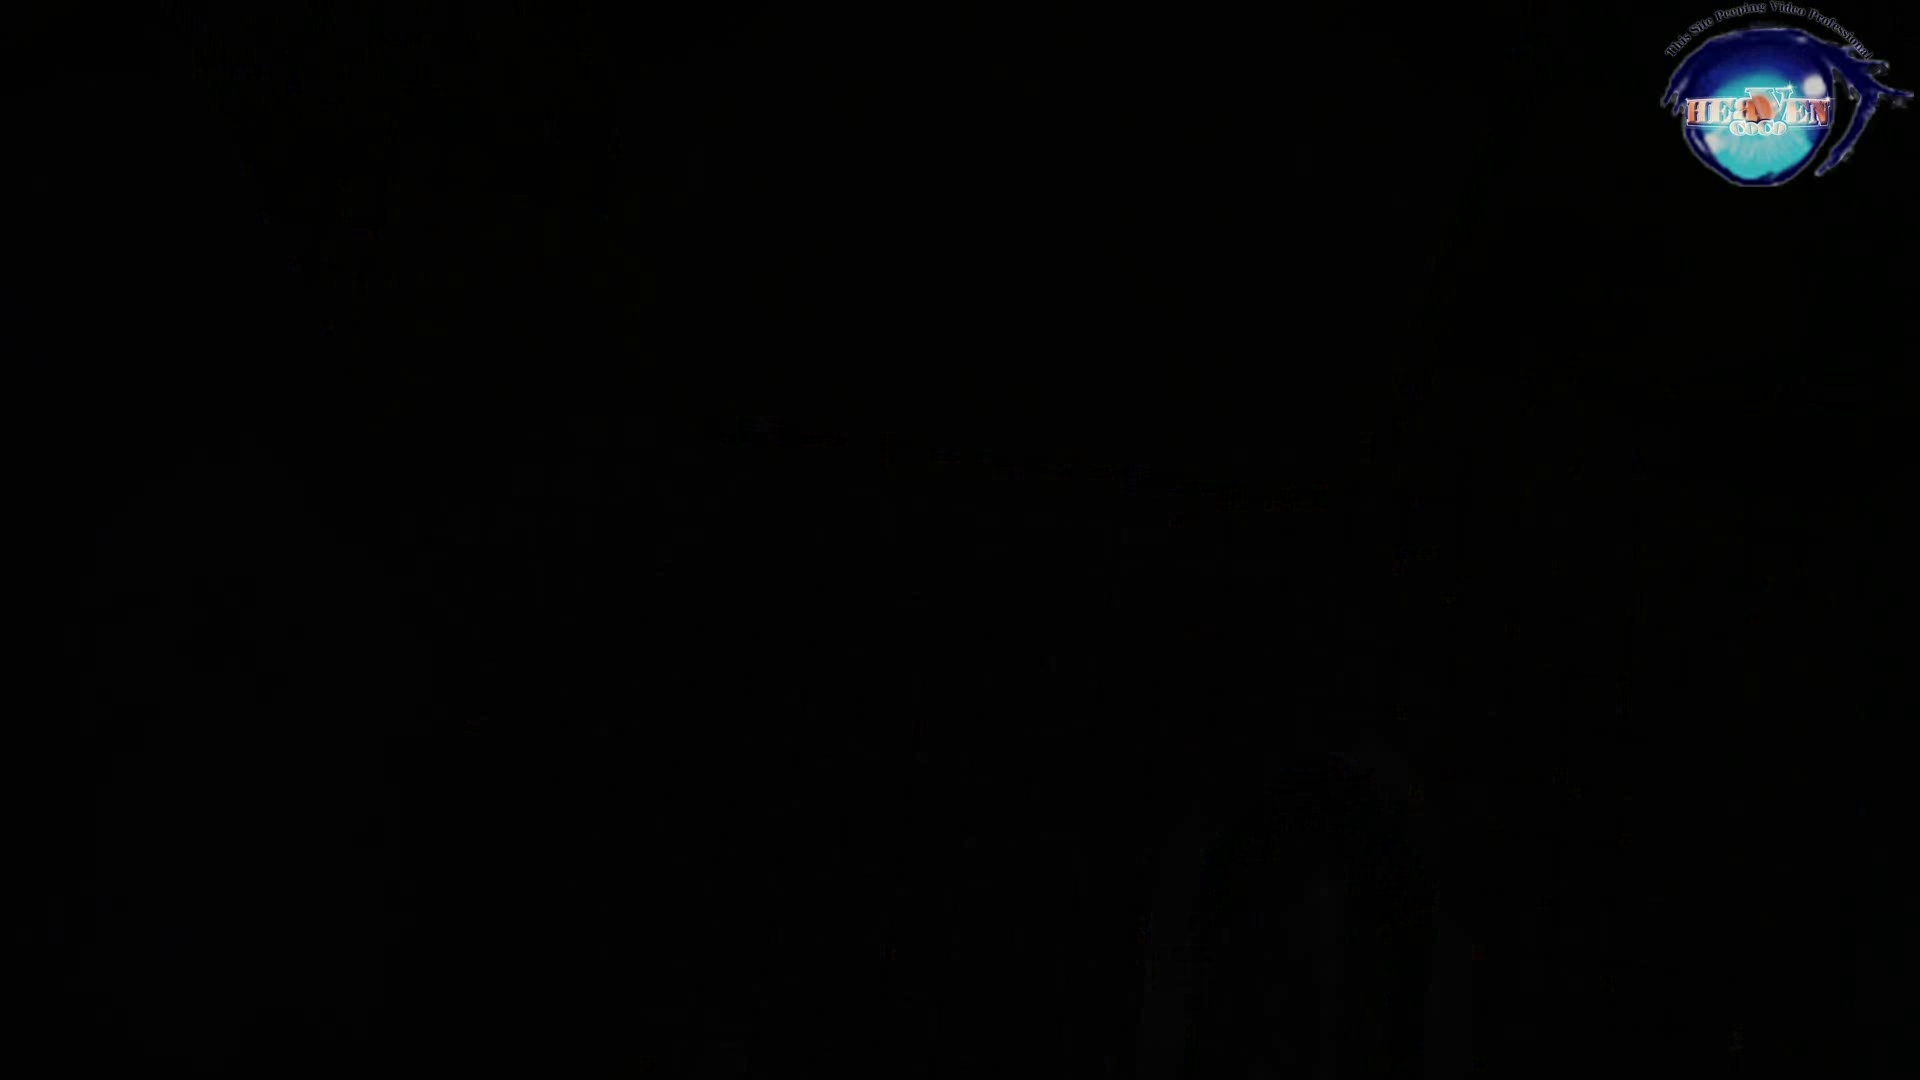 水泳大会選手の聖水 vol.09 トイレ   全裸 盗撮 106PIX 97